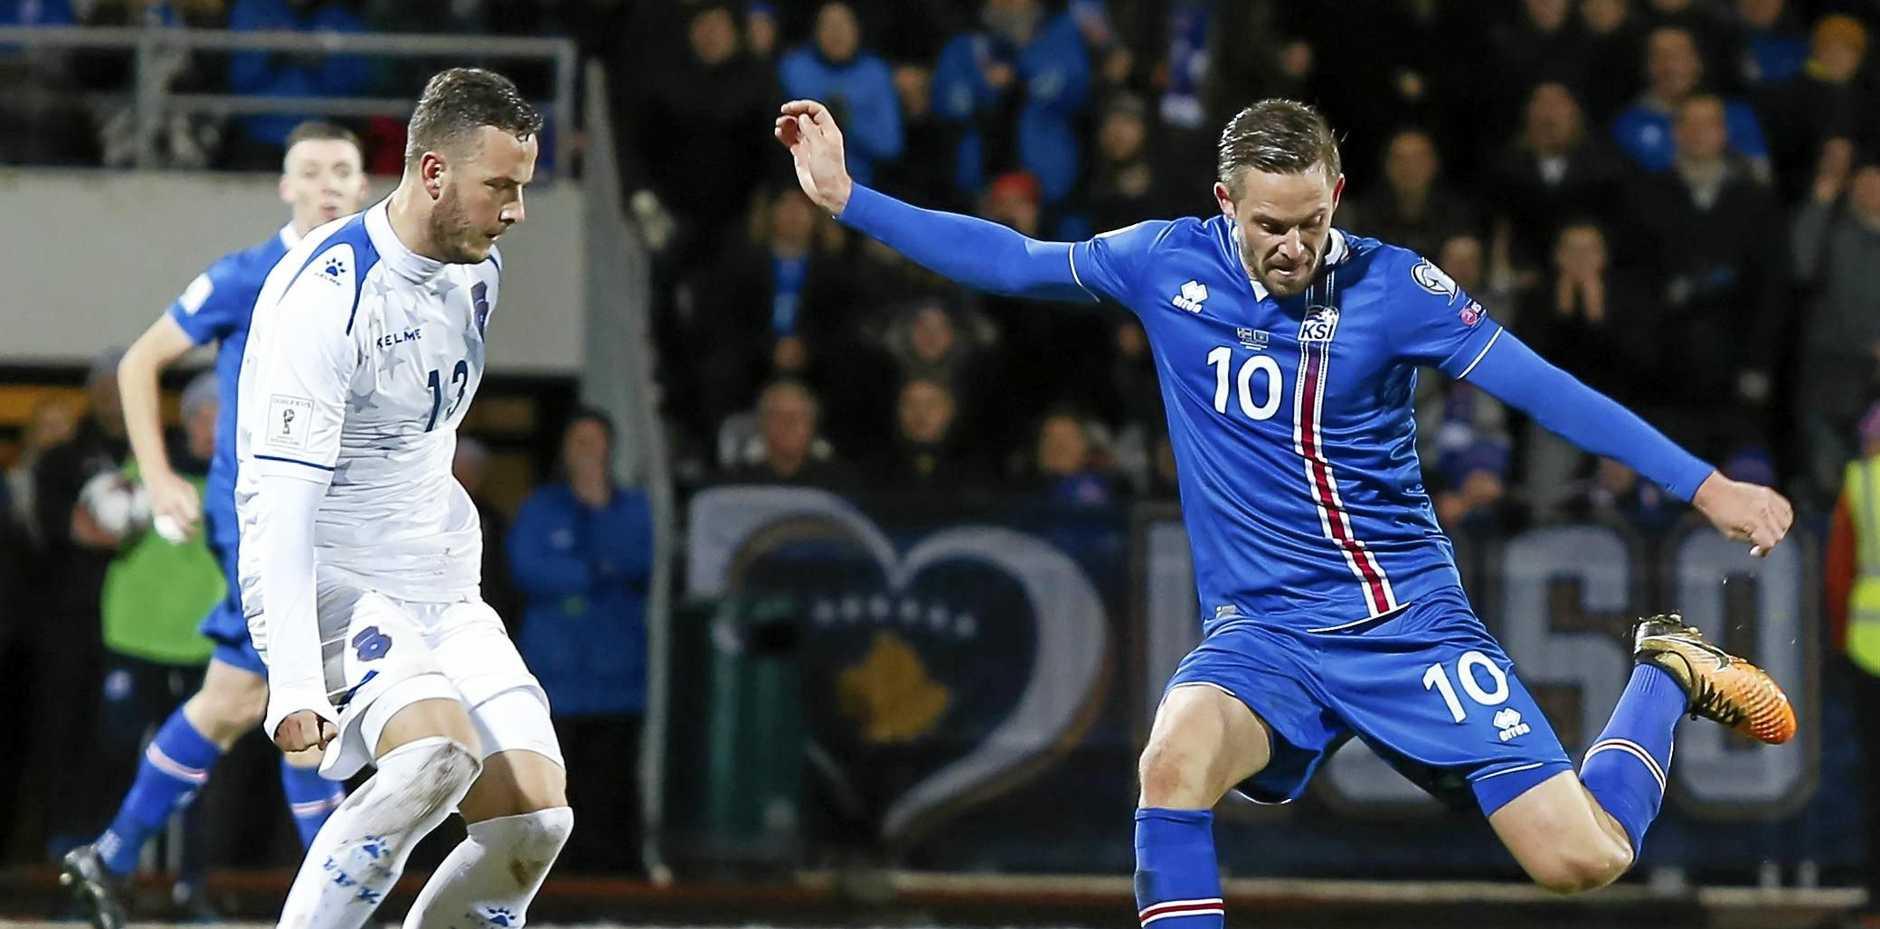 Iceland's scorer Gylfi Sigurdsson takes a shot at Kosovo's goal during the World Cup qualifying match in Reykjavik